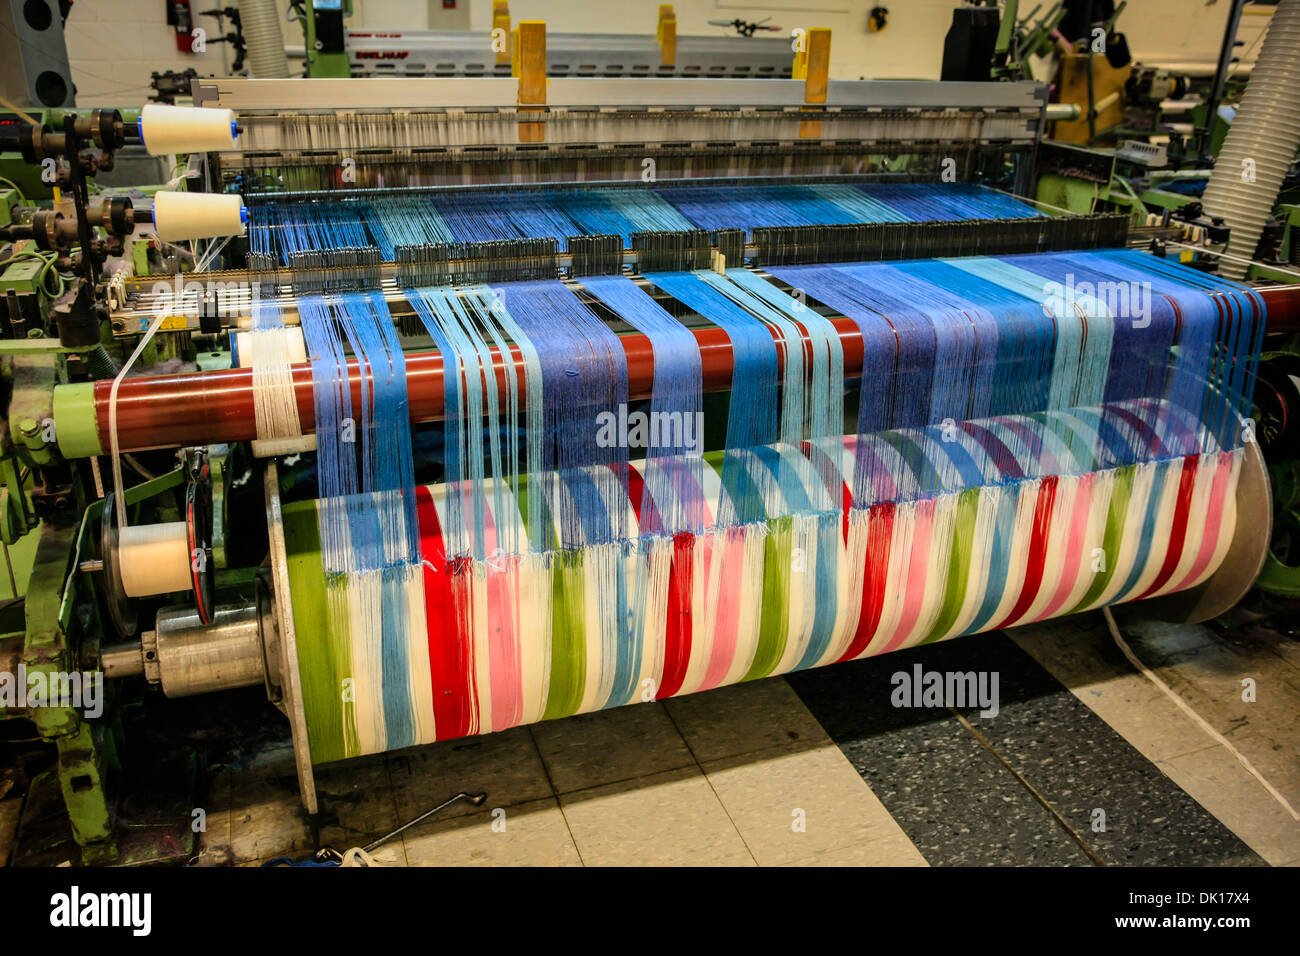 Weaving Machine Stock Photos & Weaving Machine Stock Images - Alamy